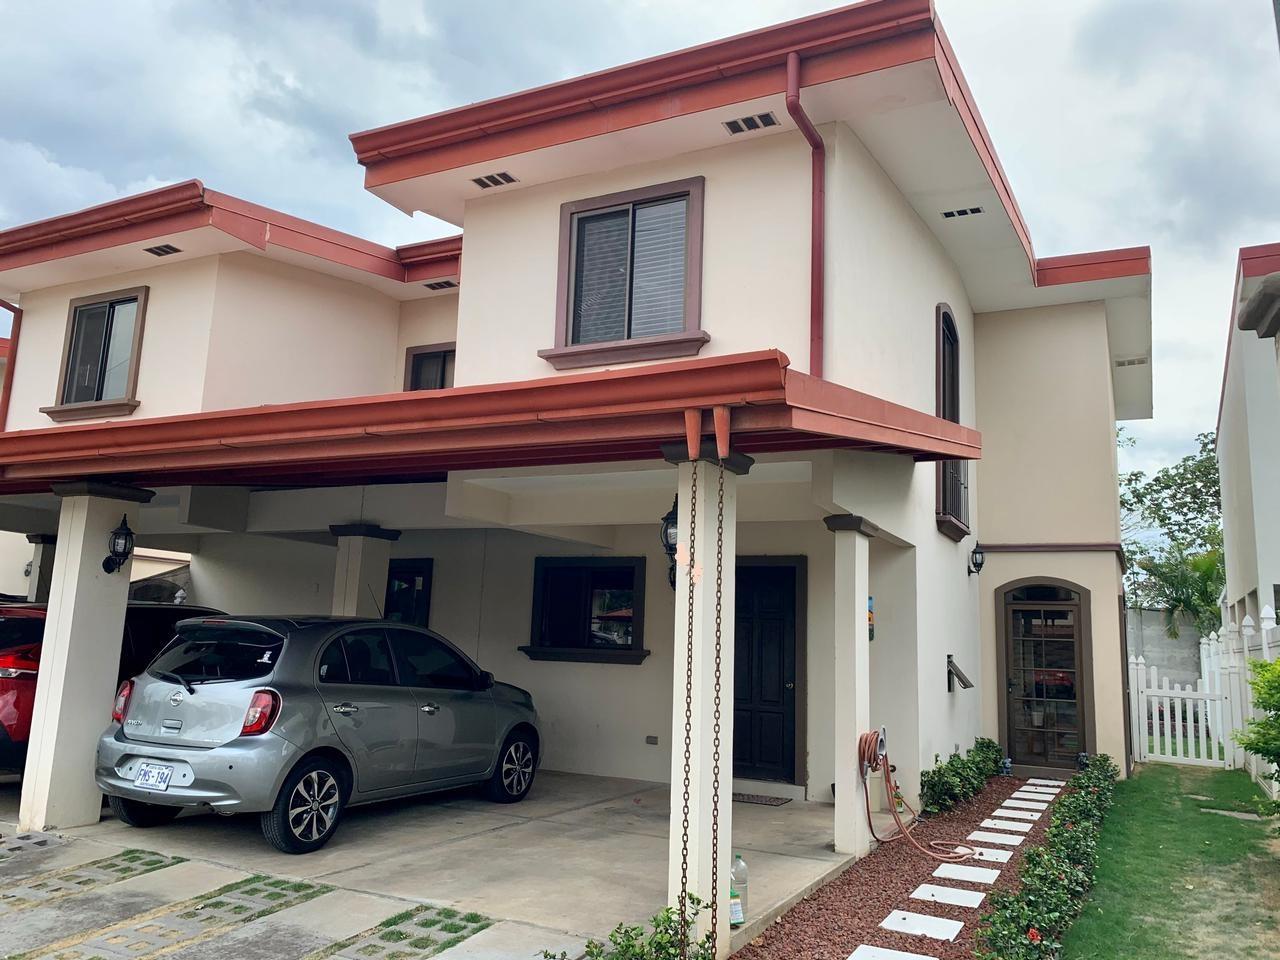 Venta de casa Vila del Lago, El Coyol de Alajuela, 195 m2, $130.000=